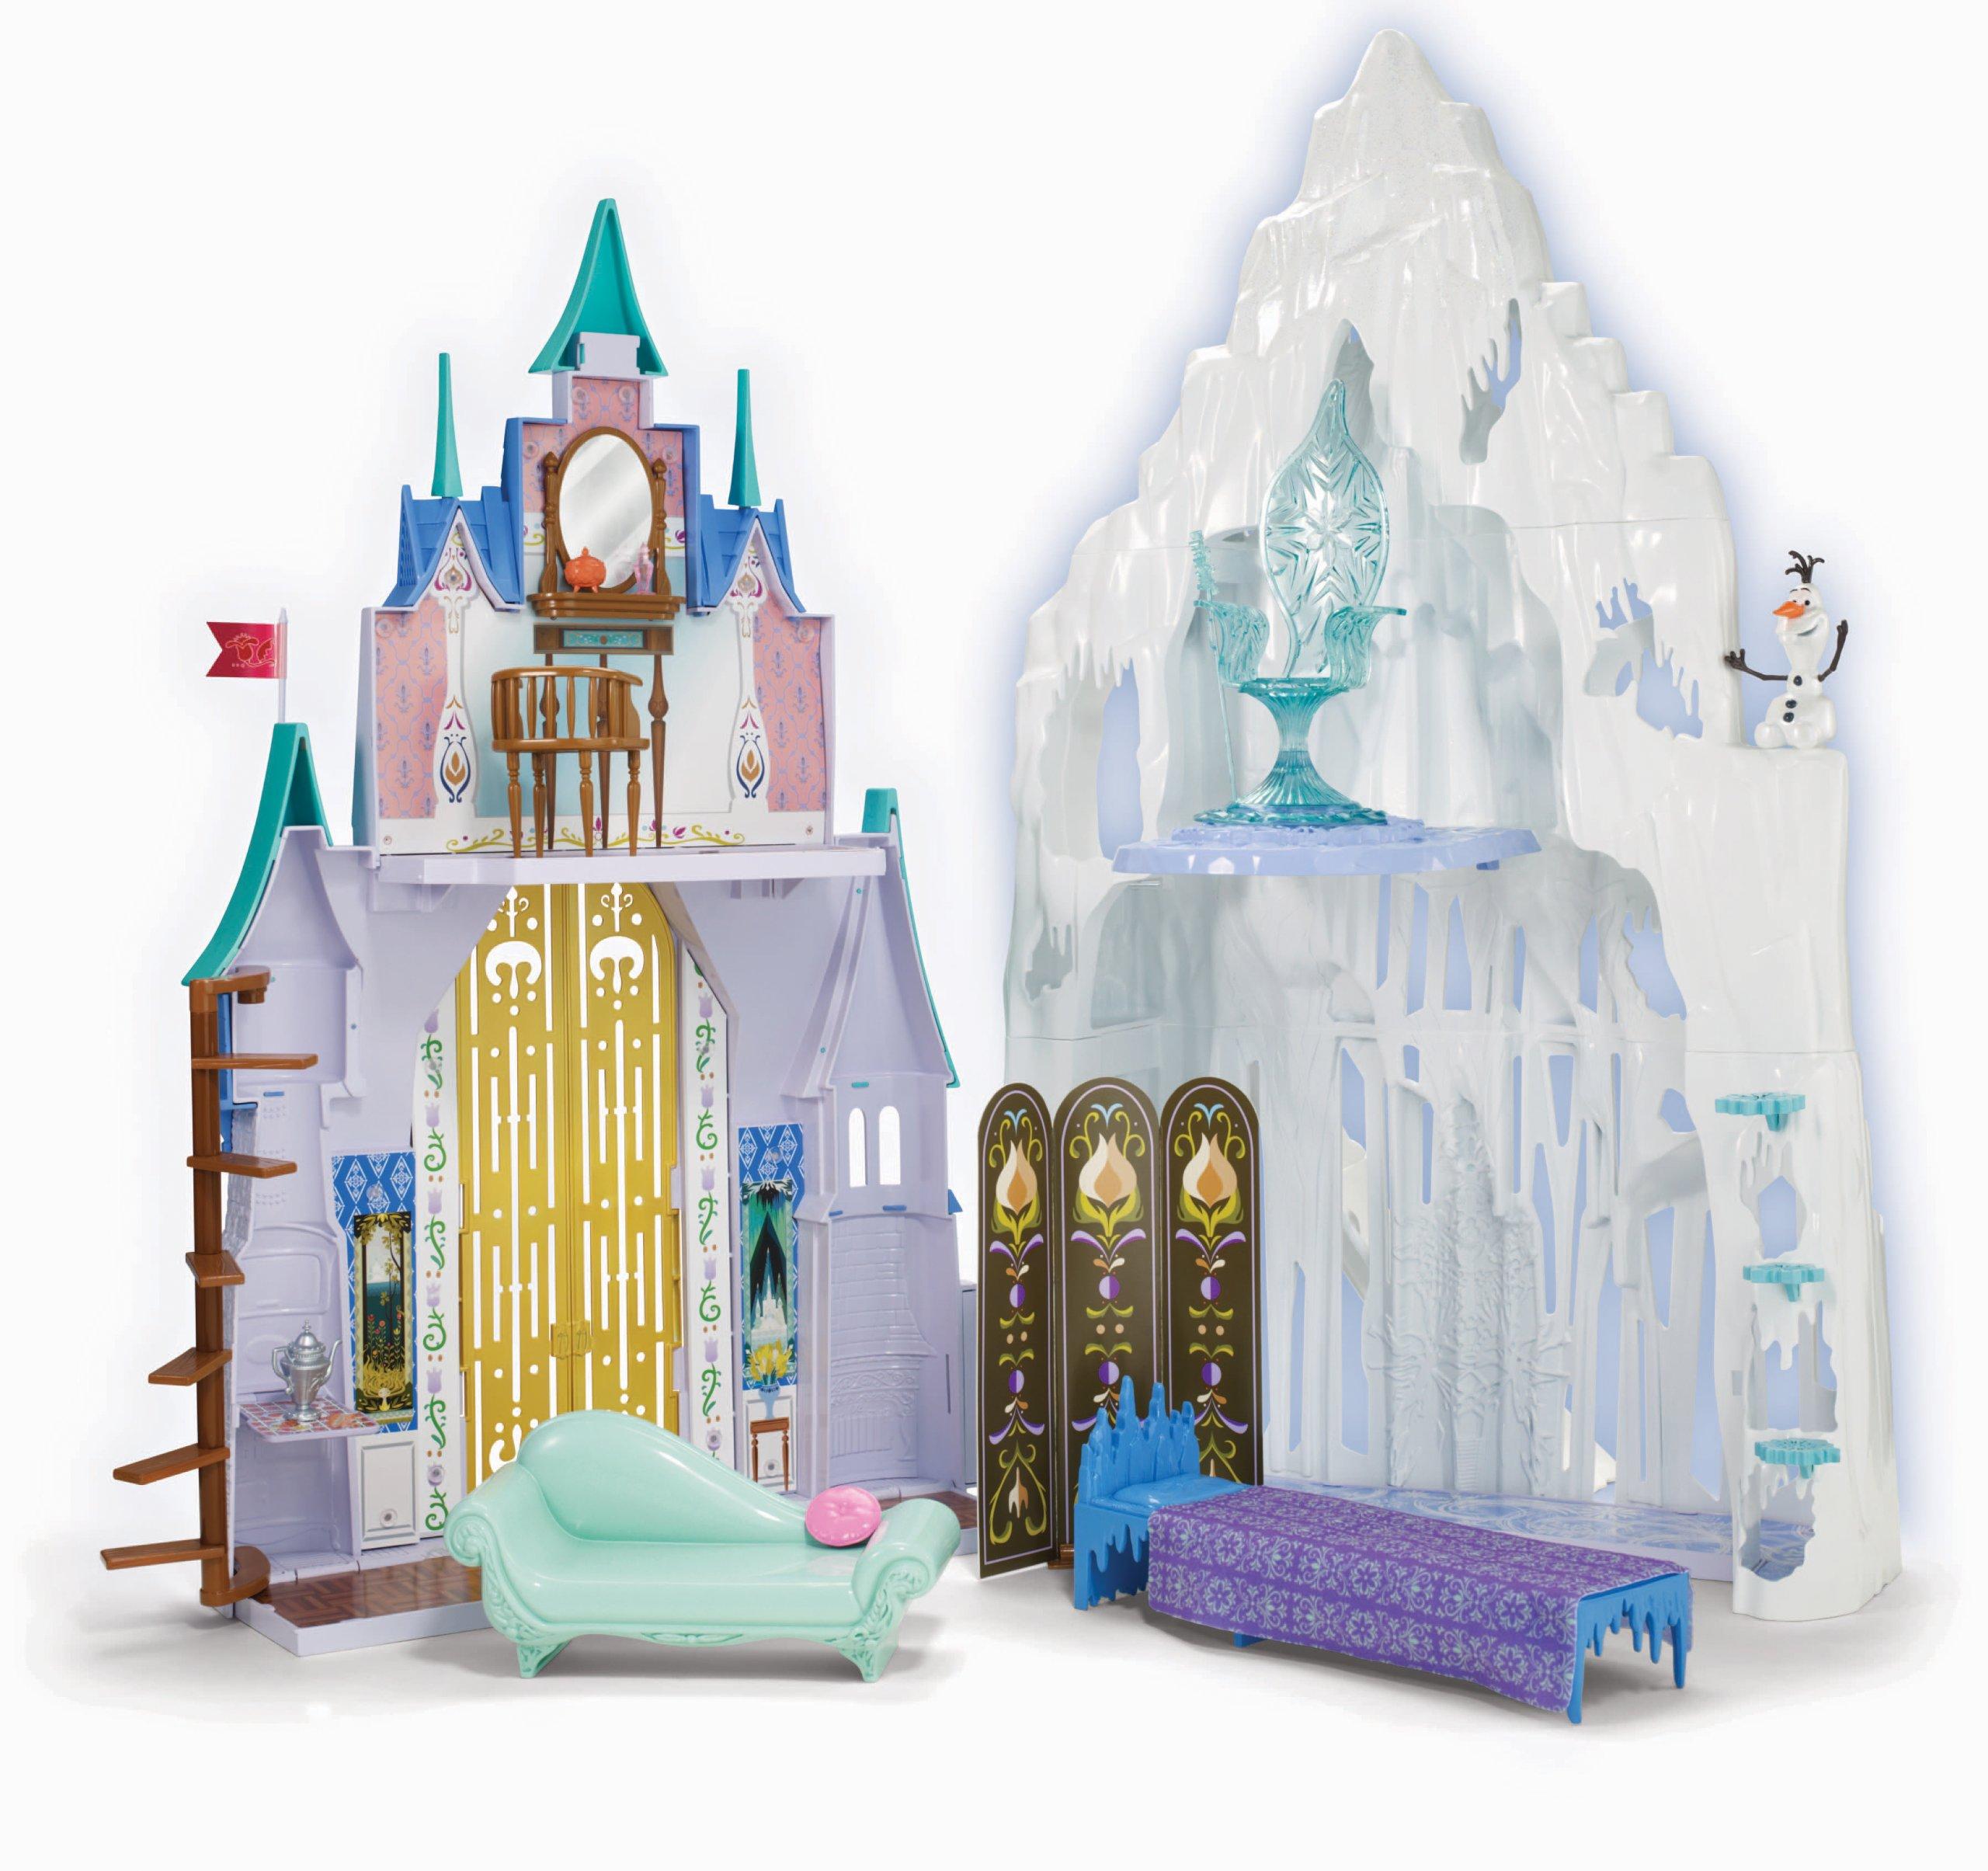 Cheap Ice Castle From Frozen Find Ice Castle From Frozen Deals On